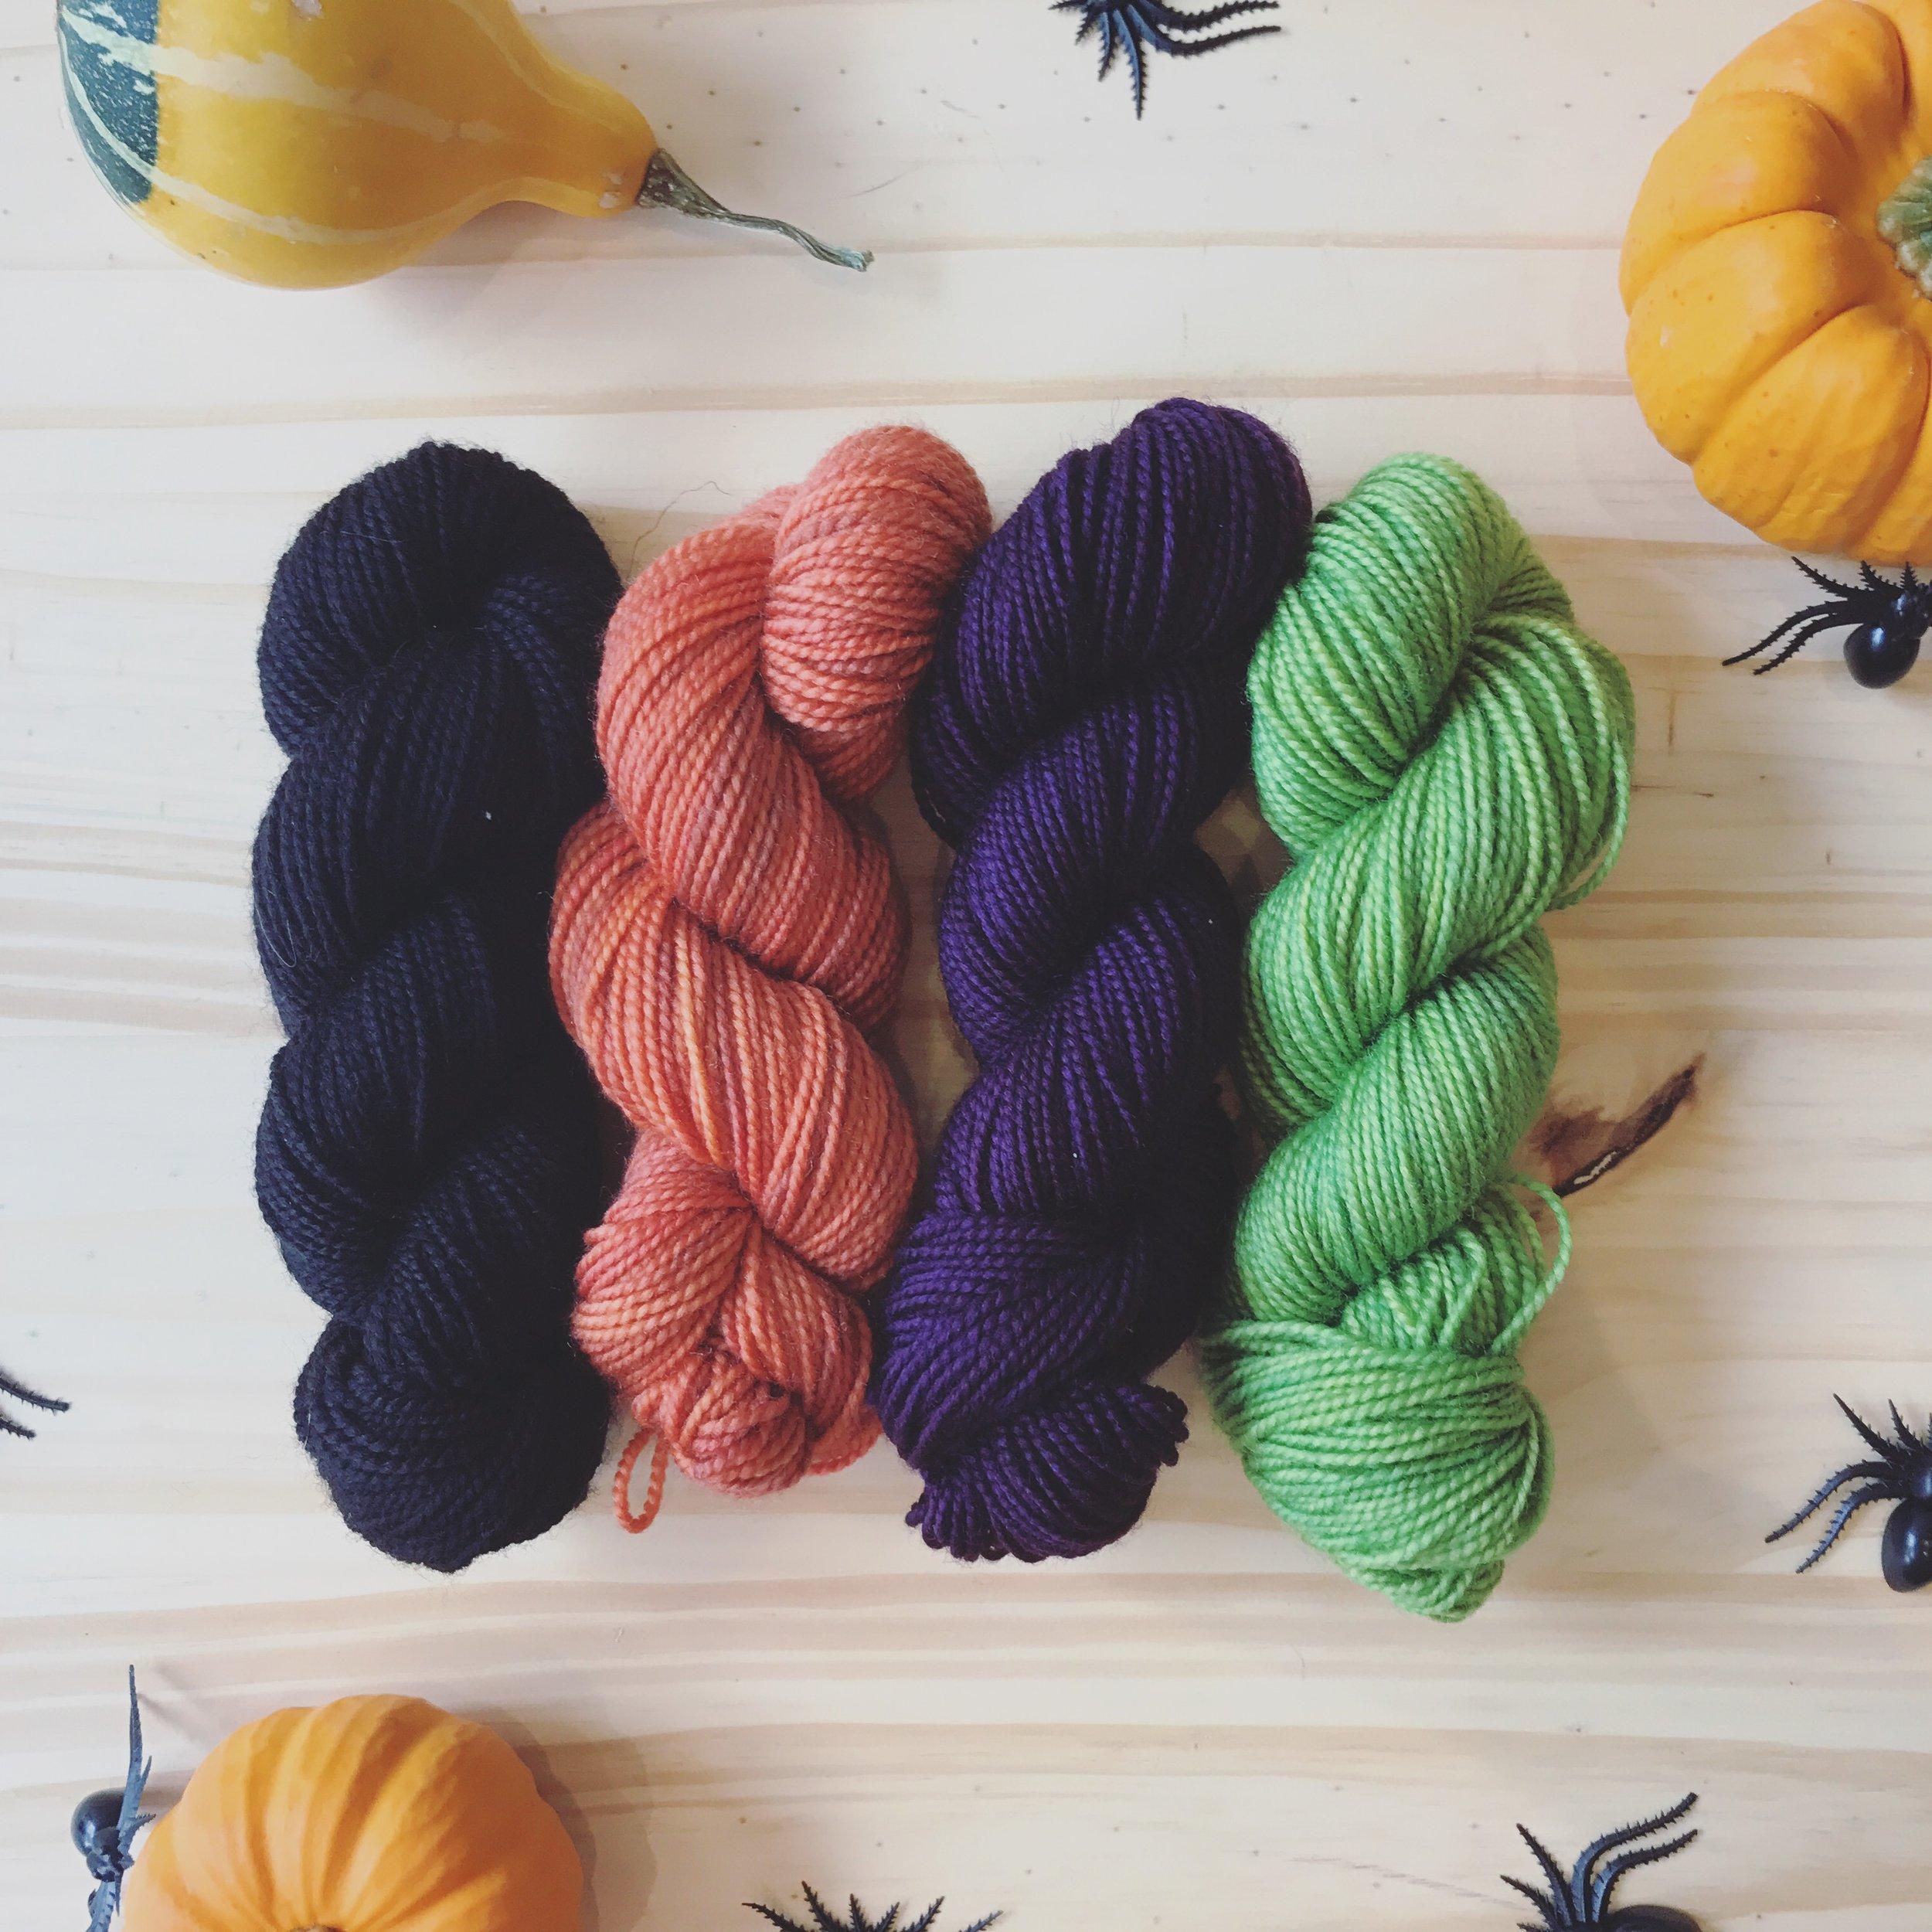 Why Knot, Monster Mash Mini Kit Image © Firefly Fiber Arts Studio